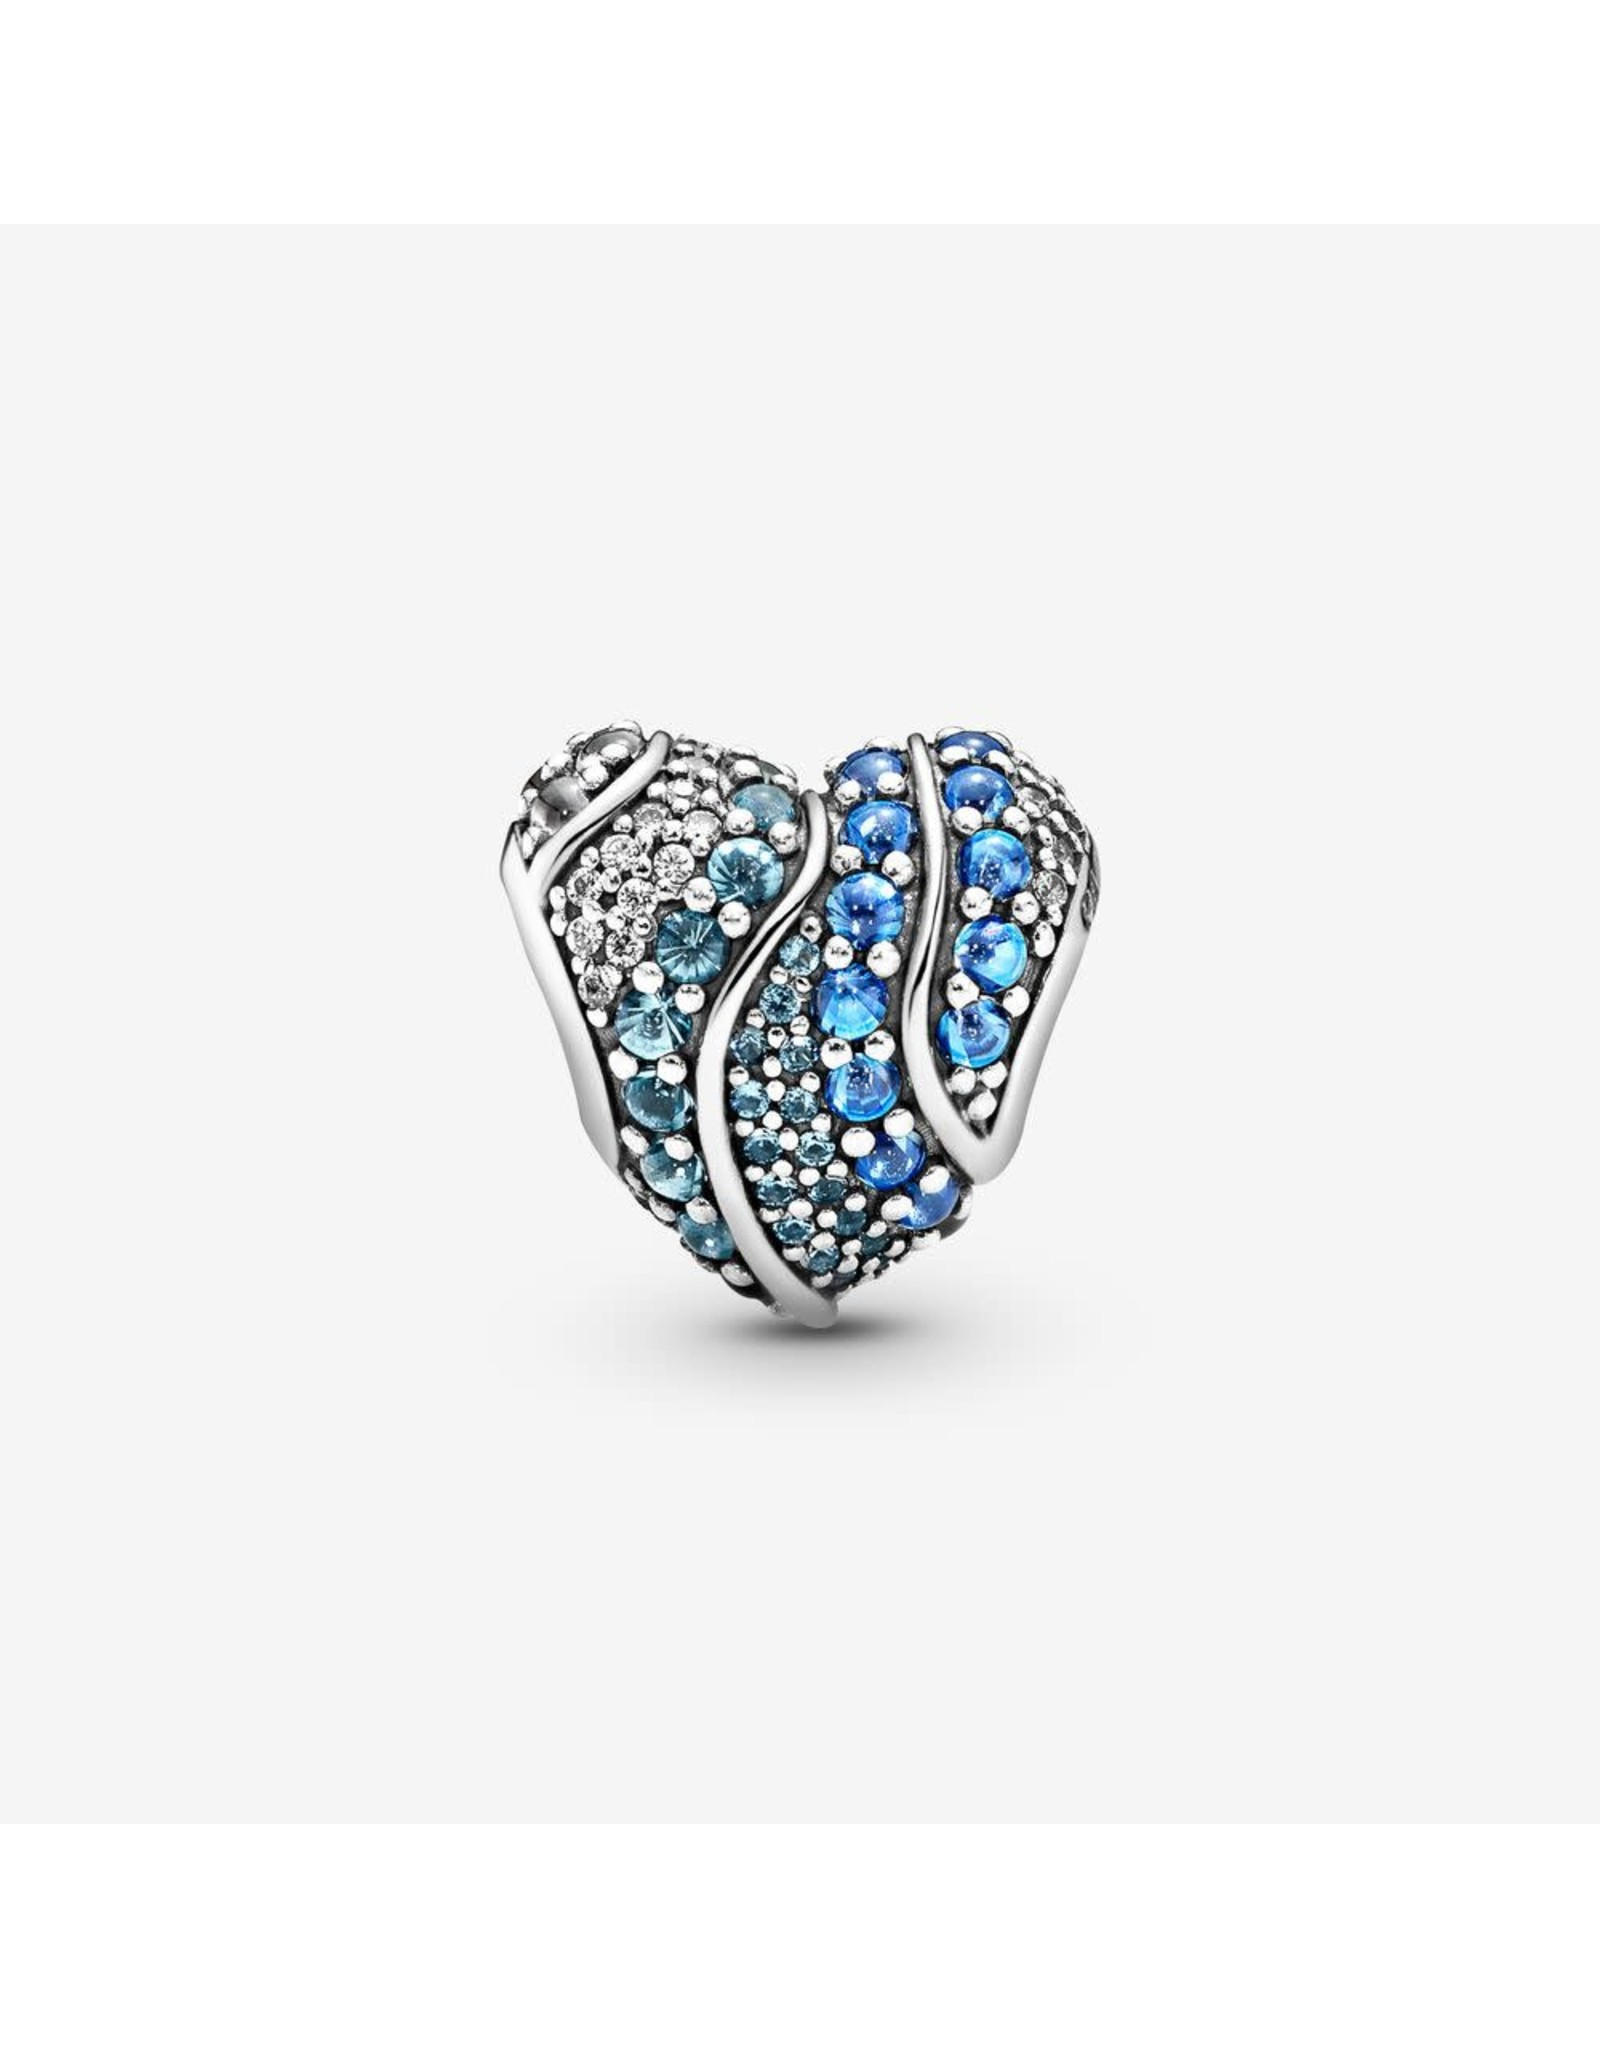 Pandora Pandora Charm Aqua Heart, Multi- Coloured CZ & Crystals